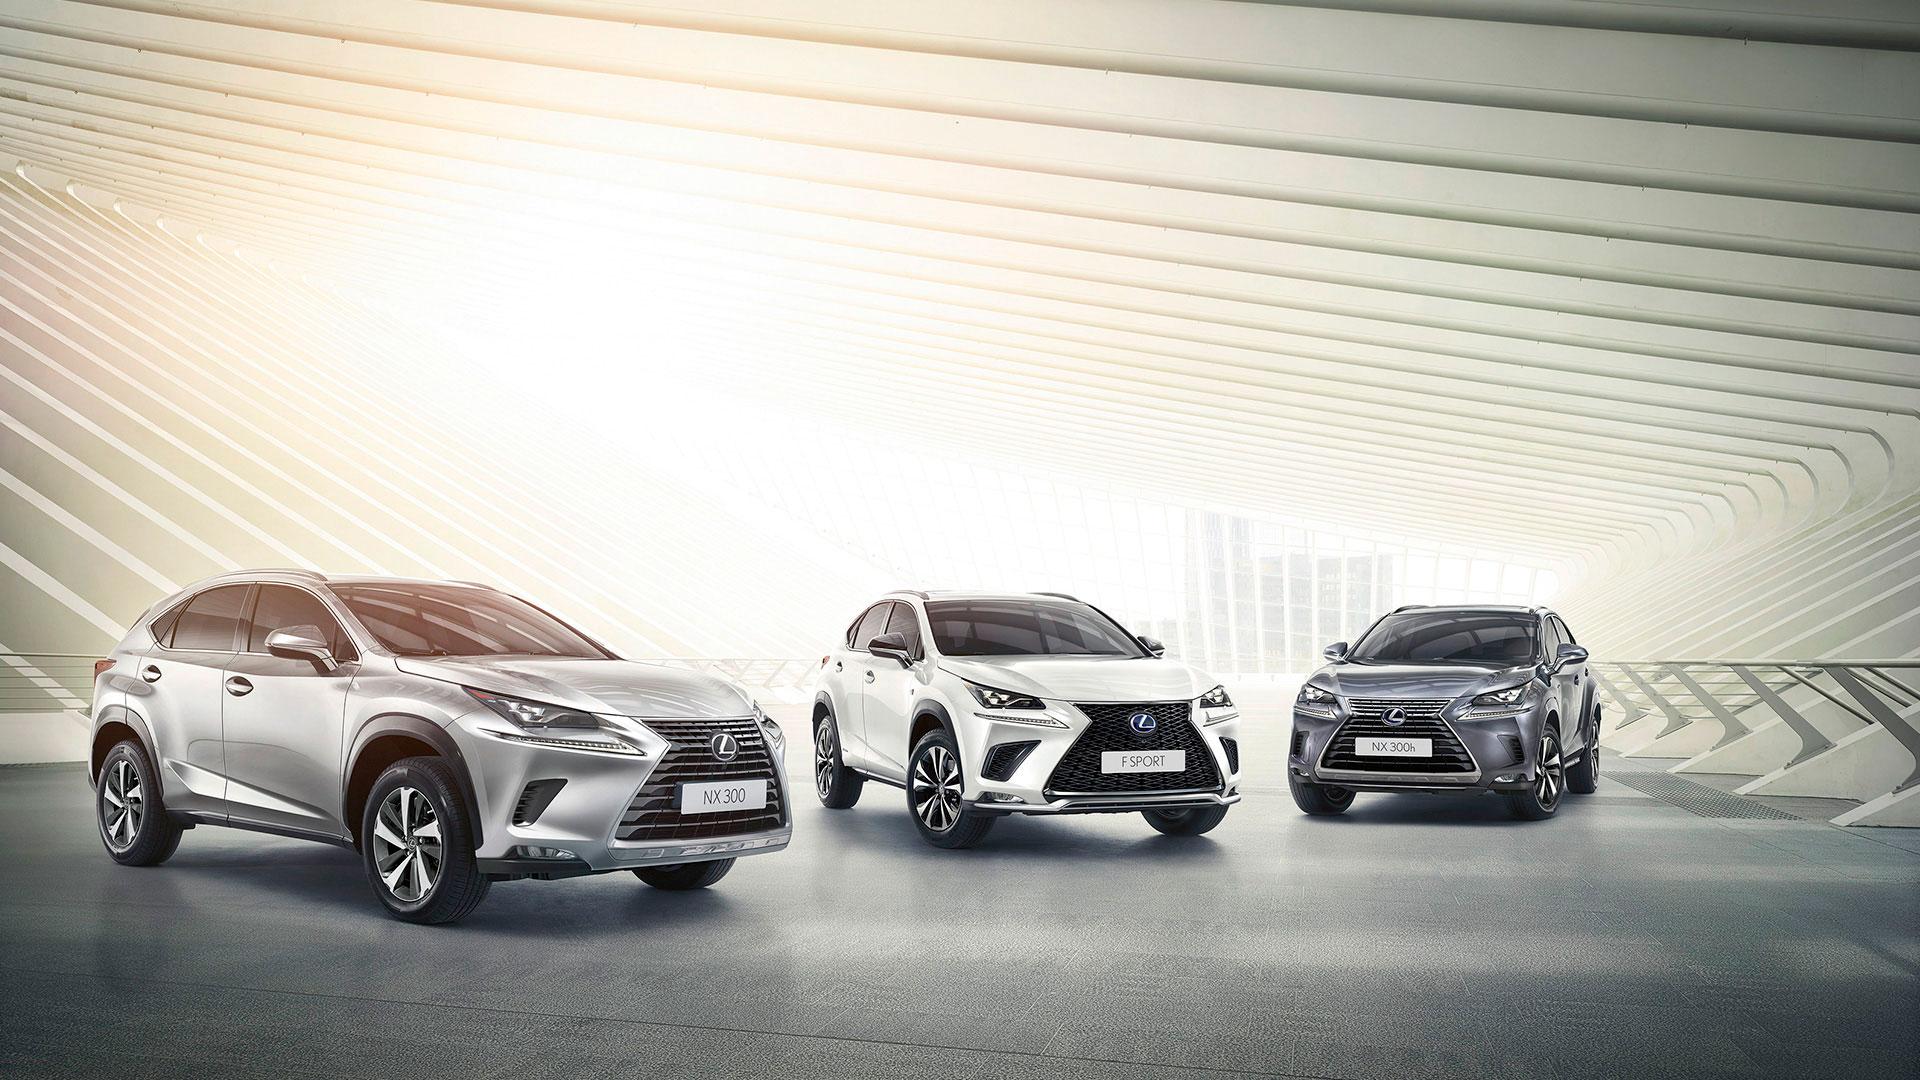 Nuevo Lexus NX hero asset